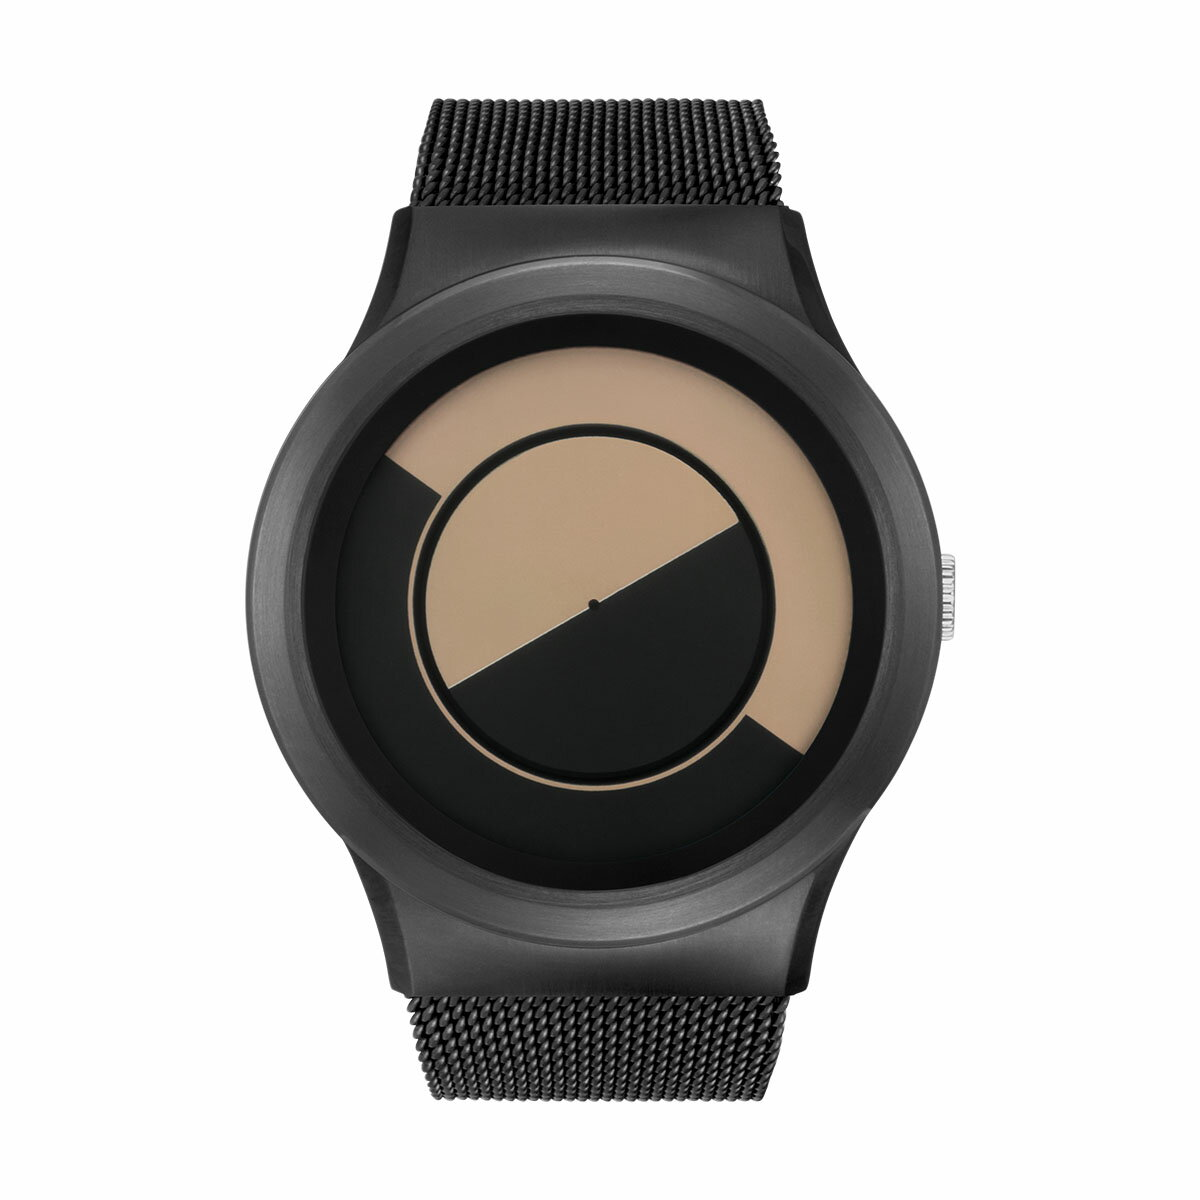 ZEROO QUARTER MOON ゼロ 電池式クォーツ 腕時計 [W08033B03SM03] ベージュ デザインウォッチ ペア用 メンズ レディース ユニセックス おしゃれ時計 デザイナーズ